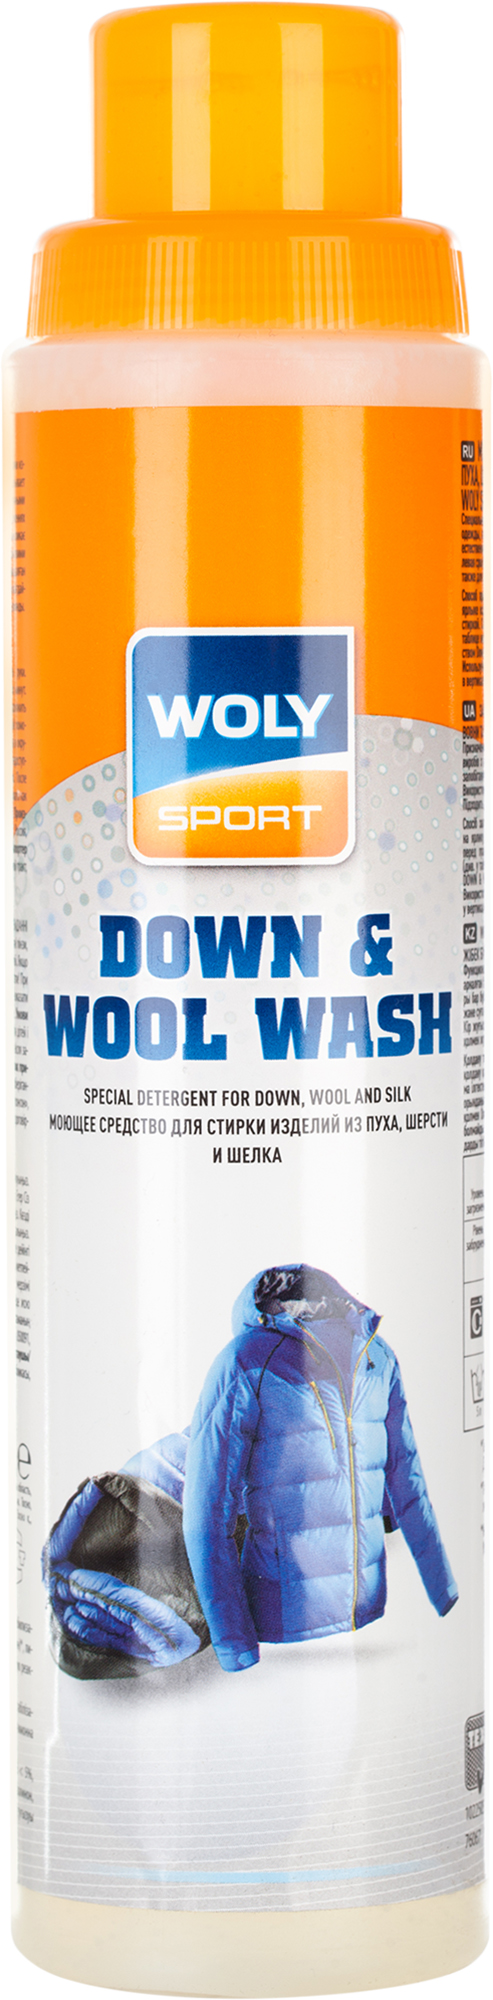 Woly Моющее средство для стирки пуха, шерсти и шелка Sport Down & Wool Wash, 260 мл